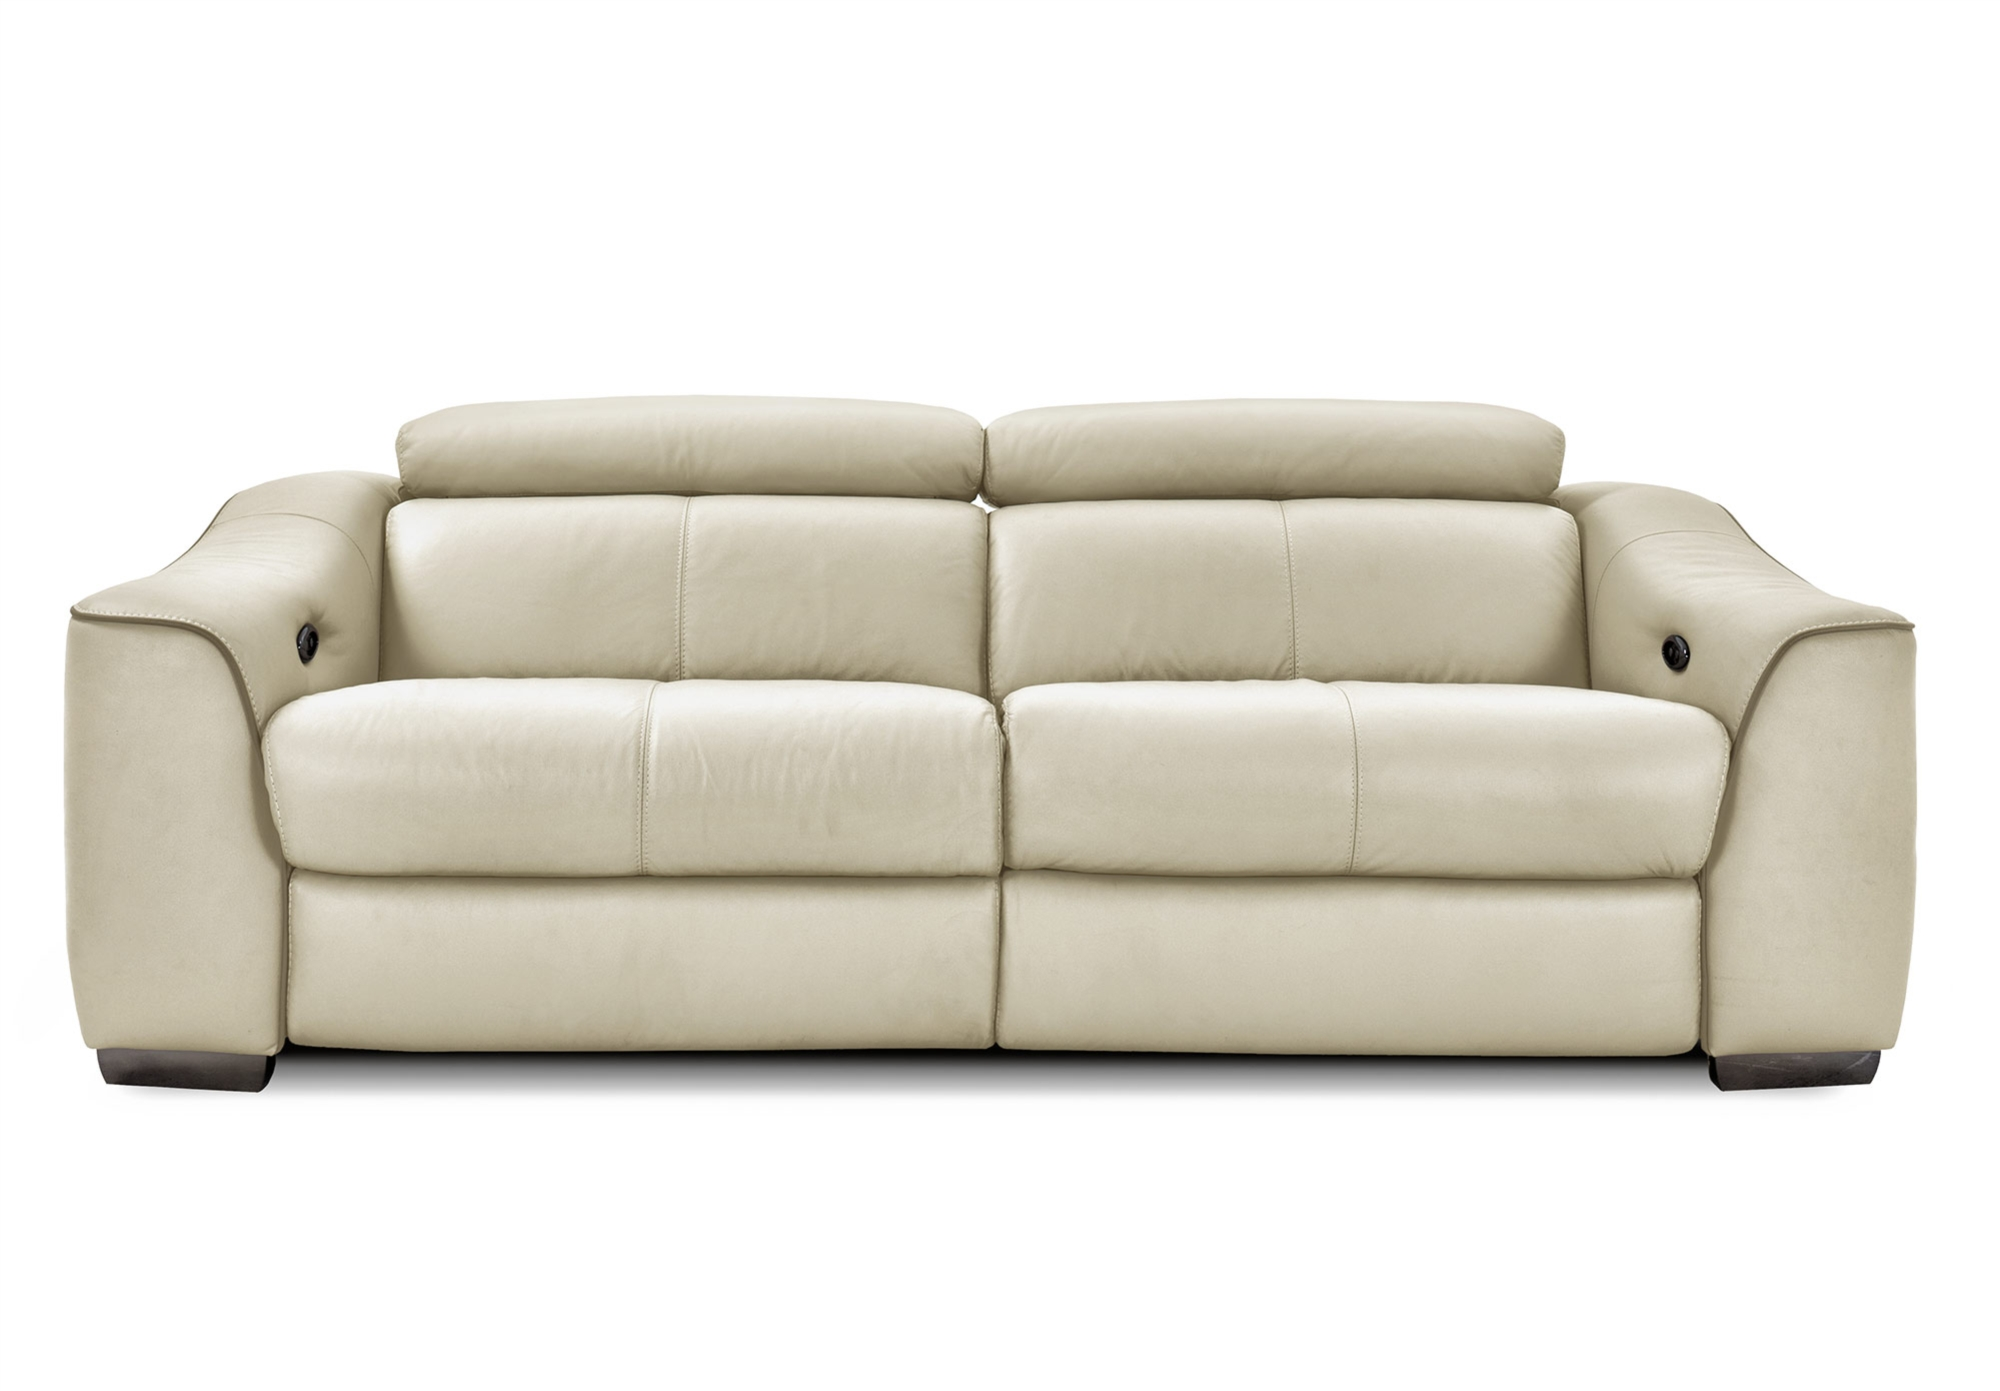 lazy boy sofa furniture village armen roxbury reviews uk natuzzi leather couches